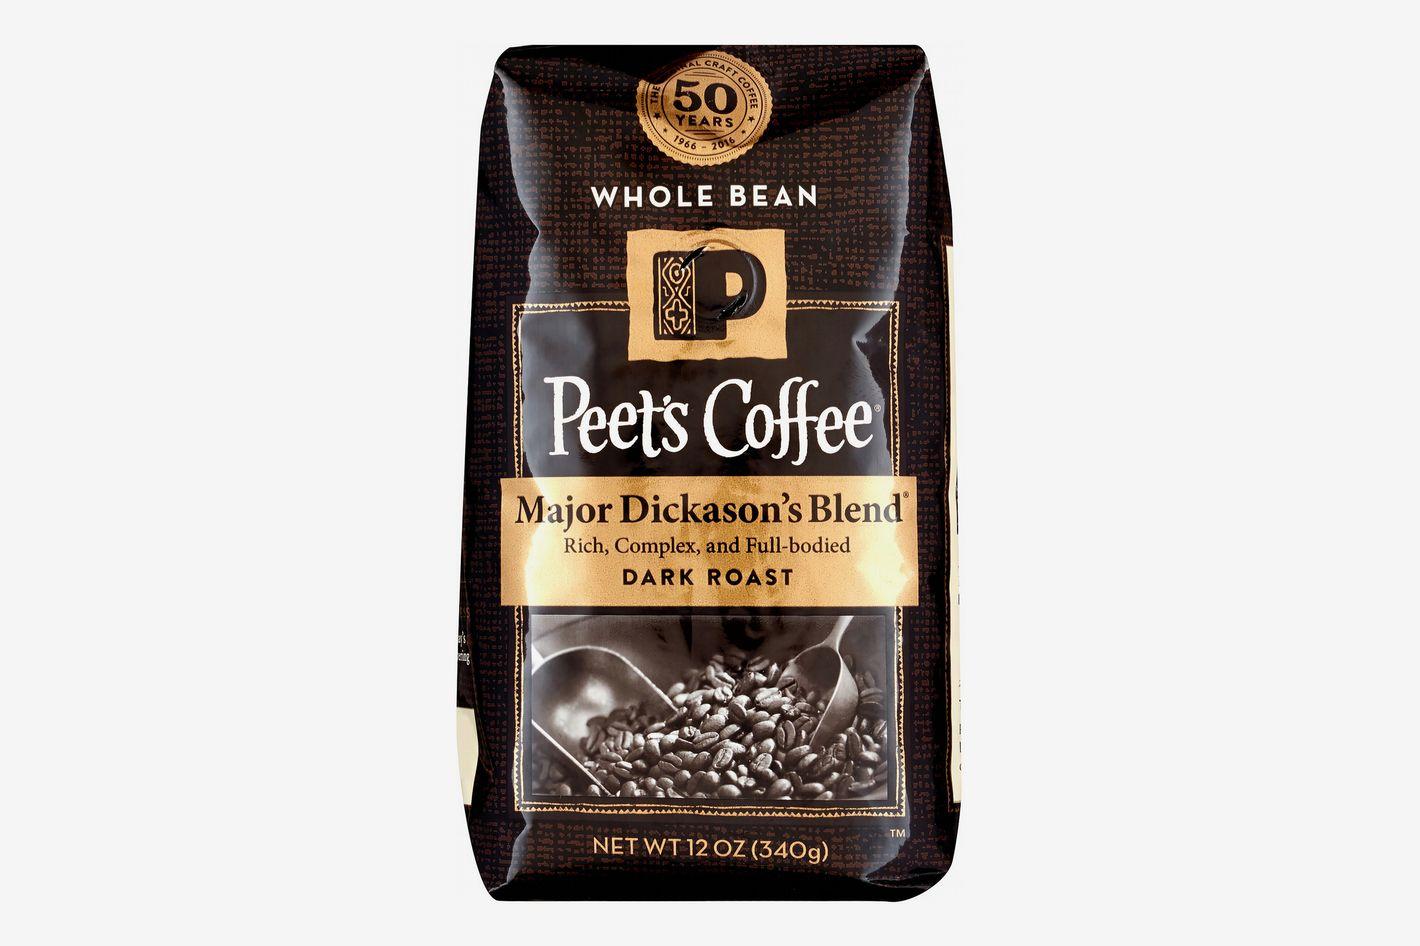 Peet's Coffee Dark Roast Whole Bean Coffee, Major Dickason's Blend